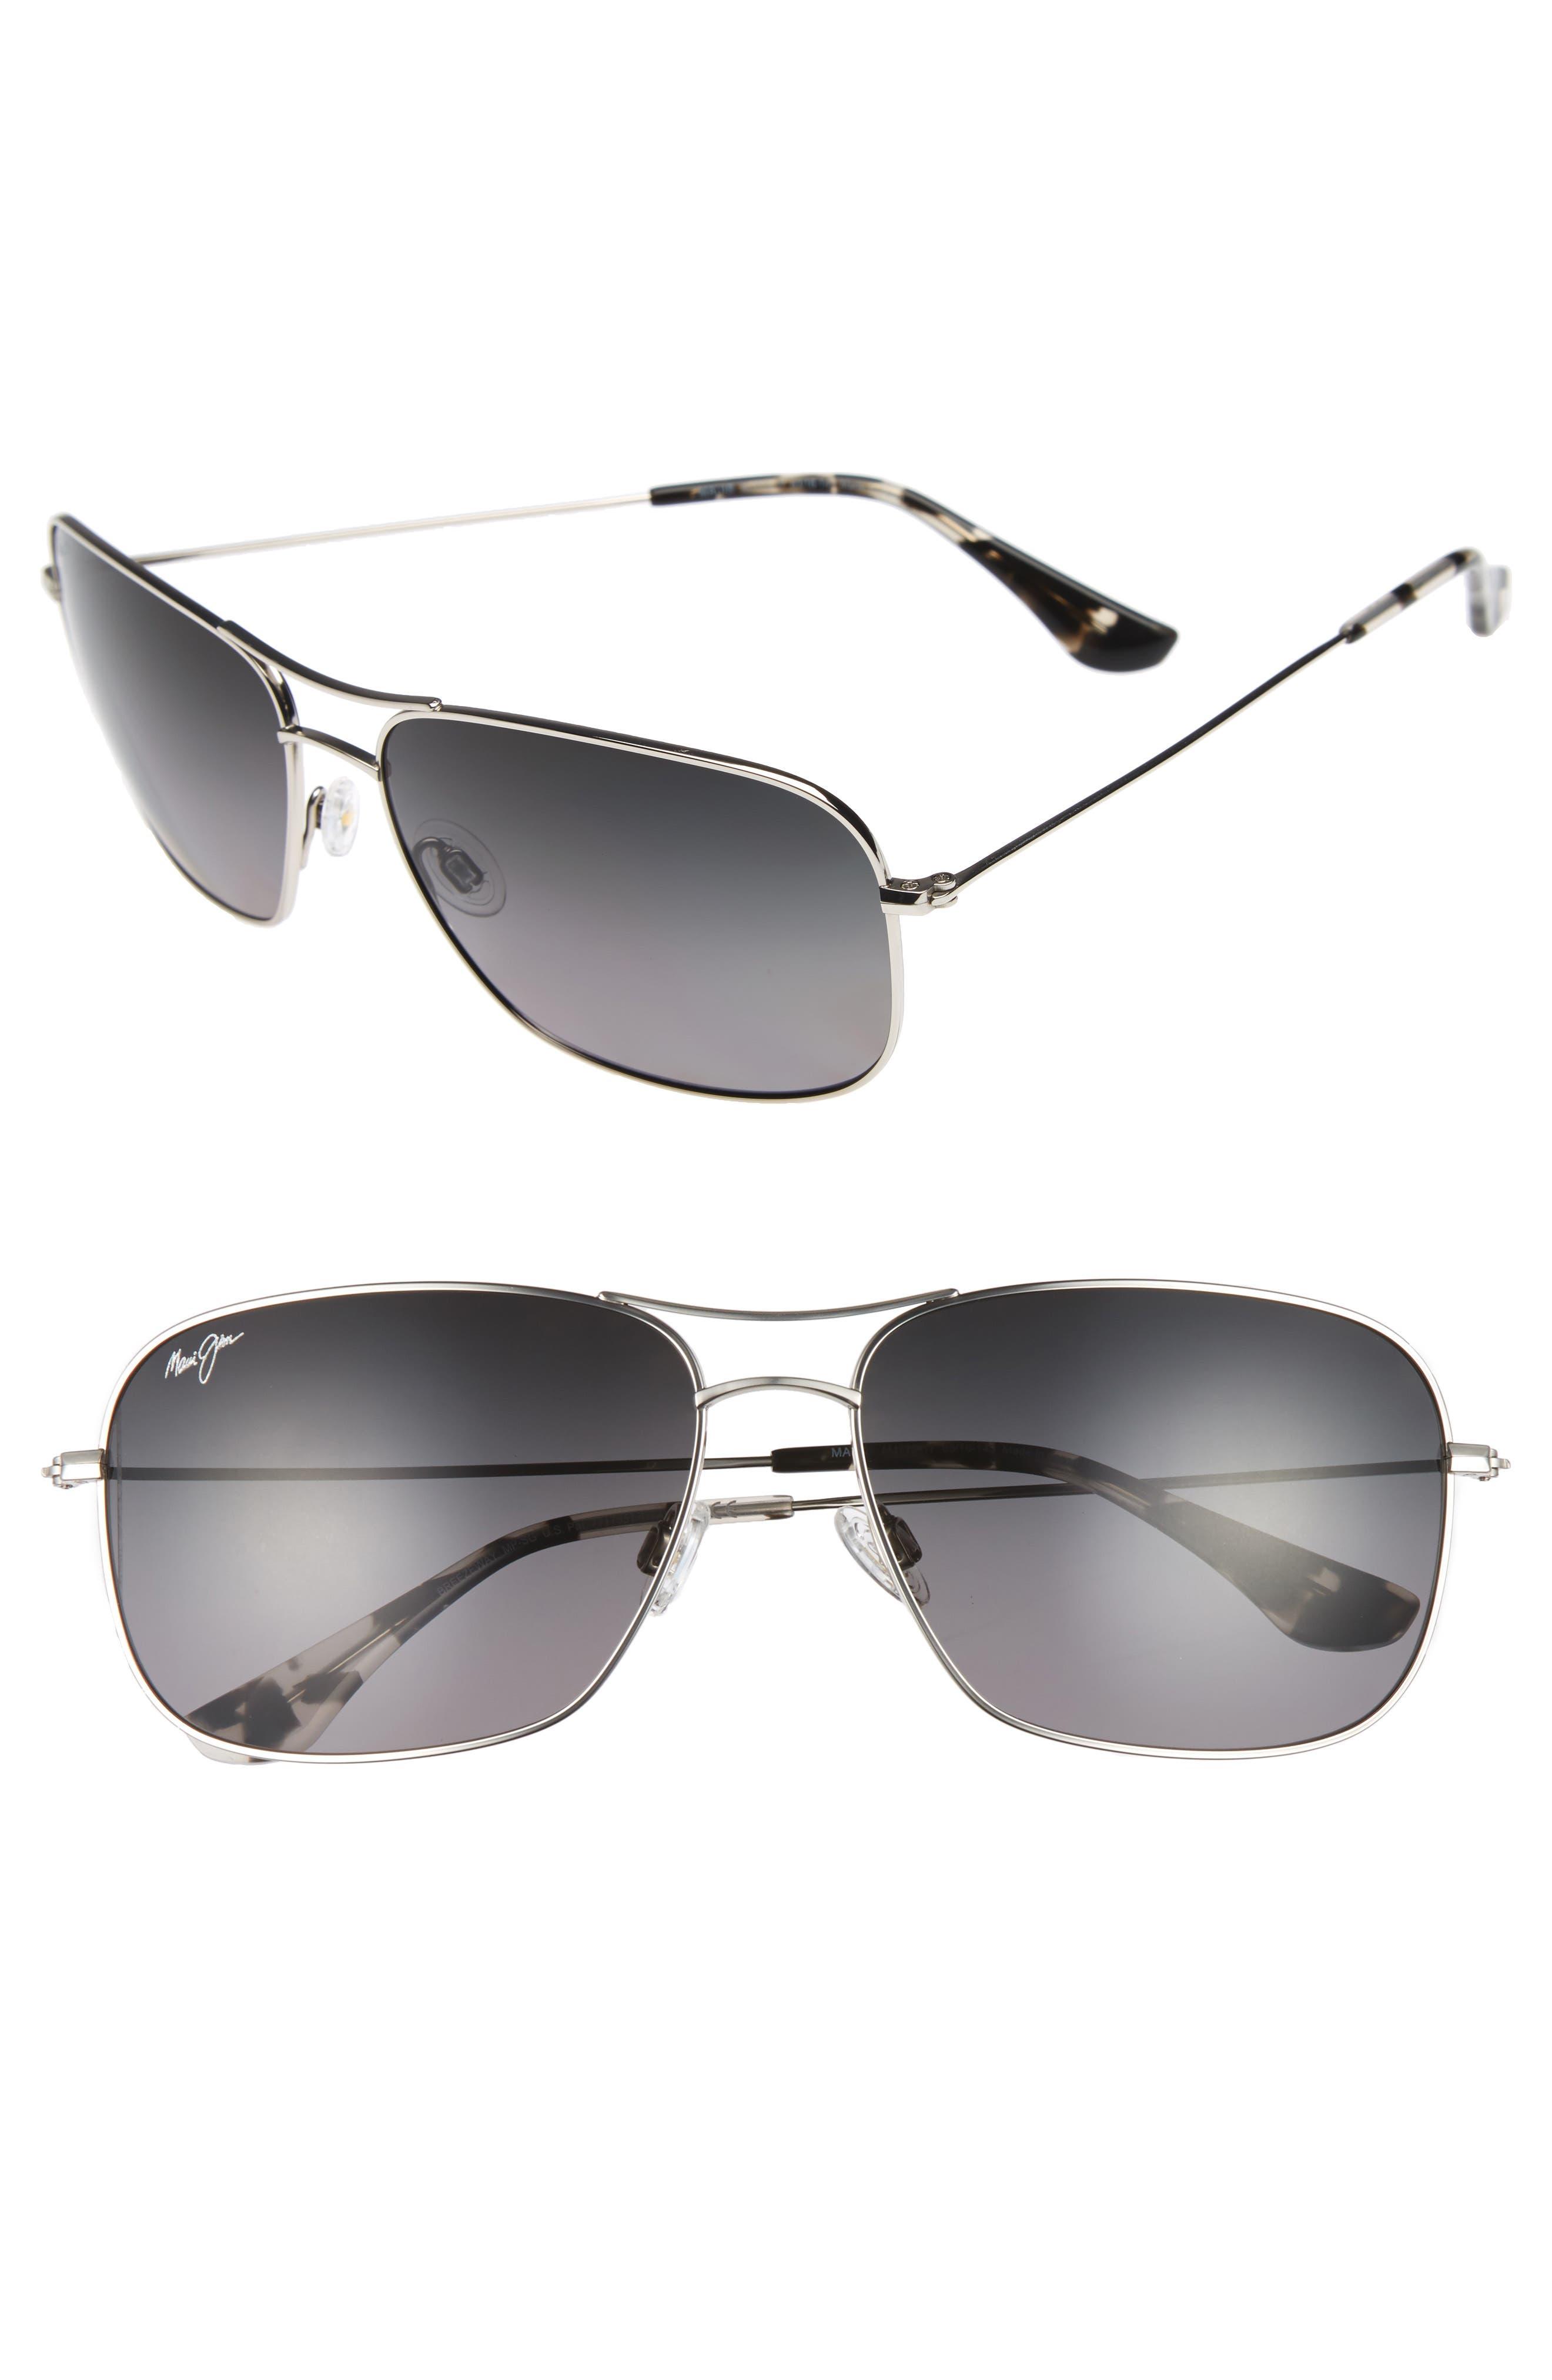 Maui Jim Breezeway 6m Polarizedplus2 Sunglasses - Silver